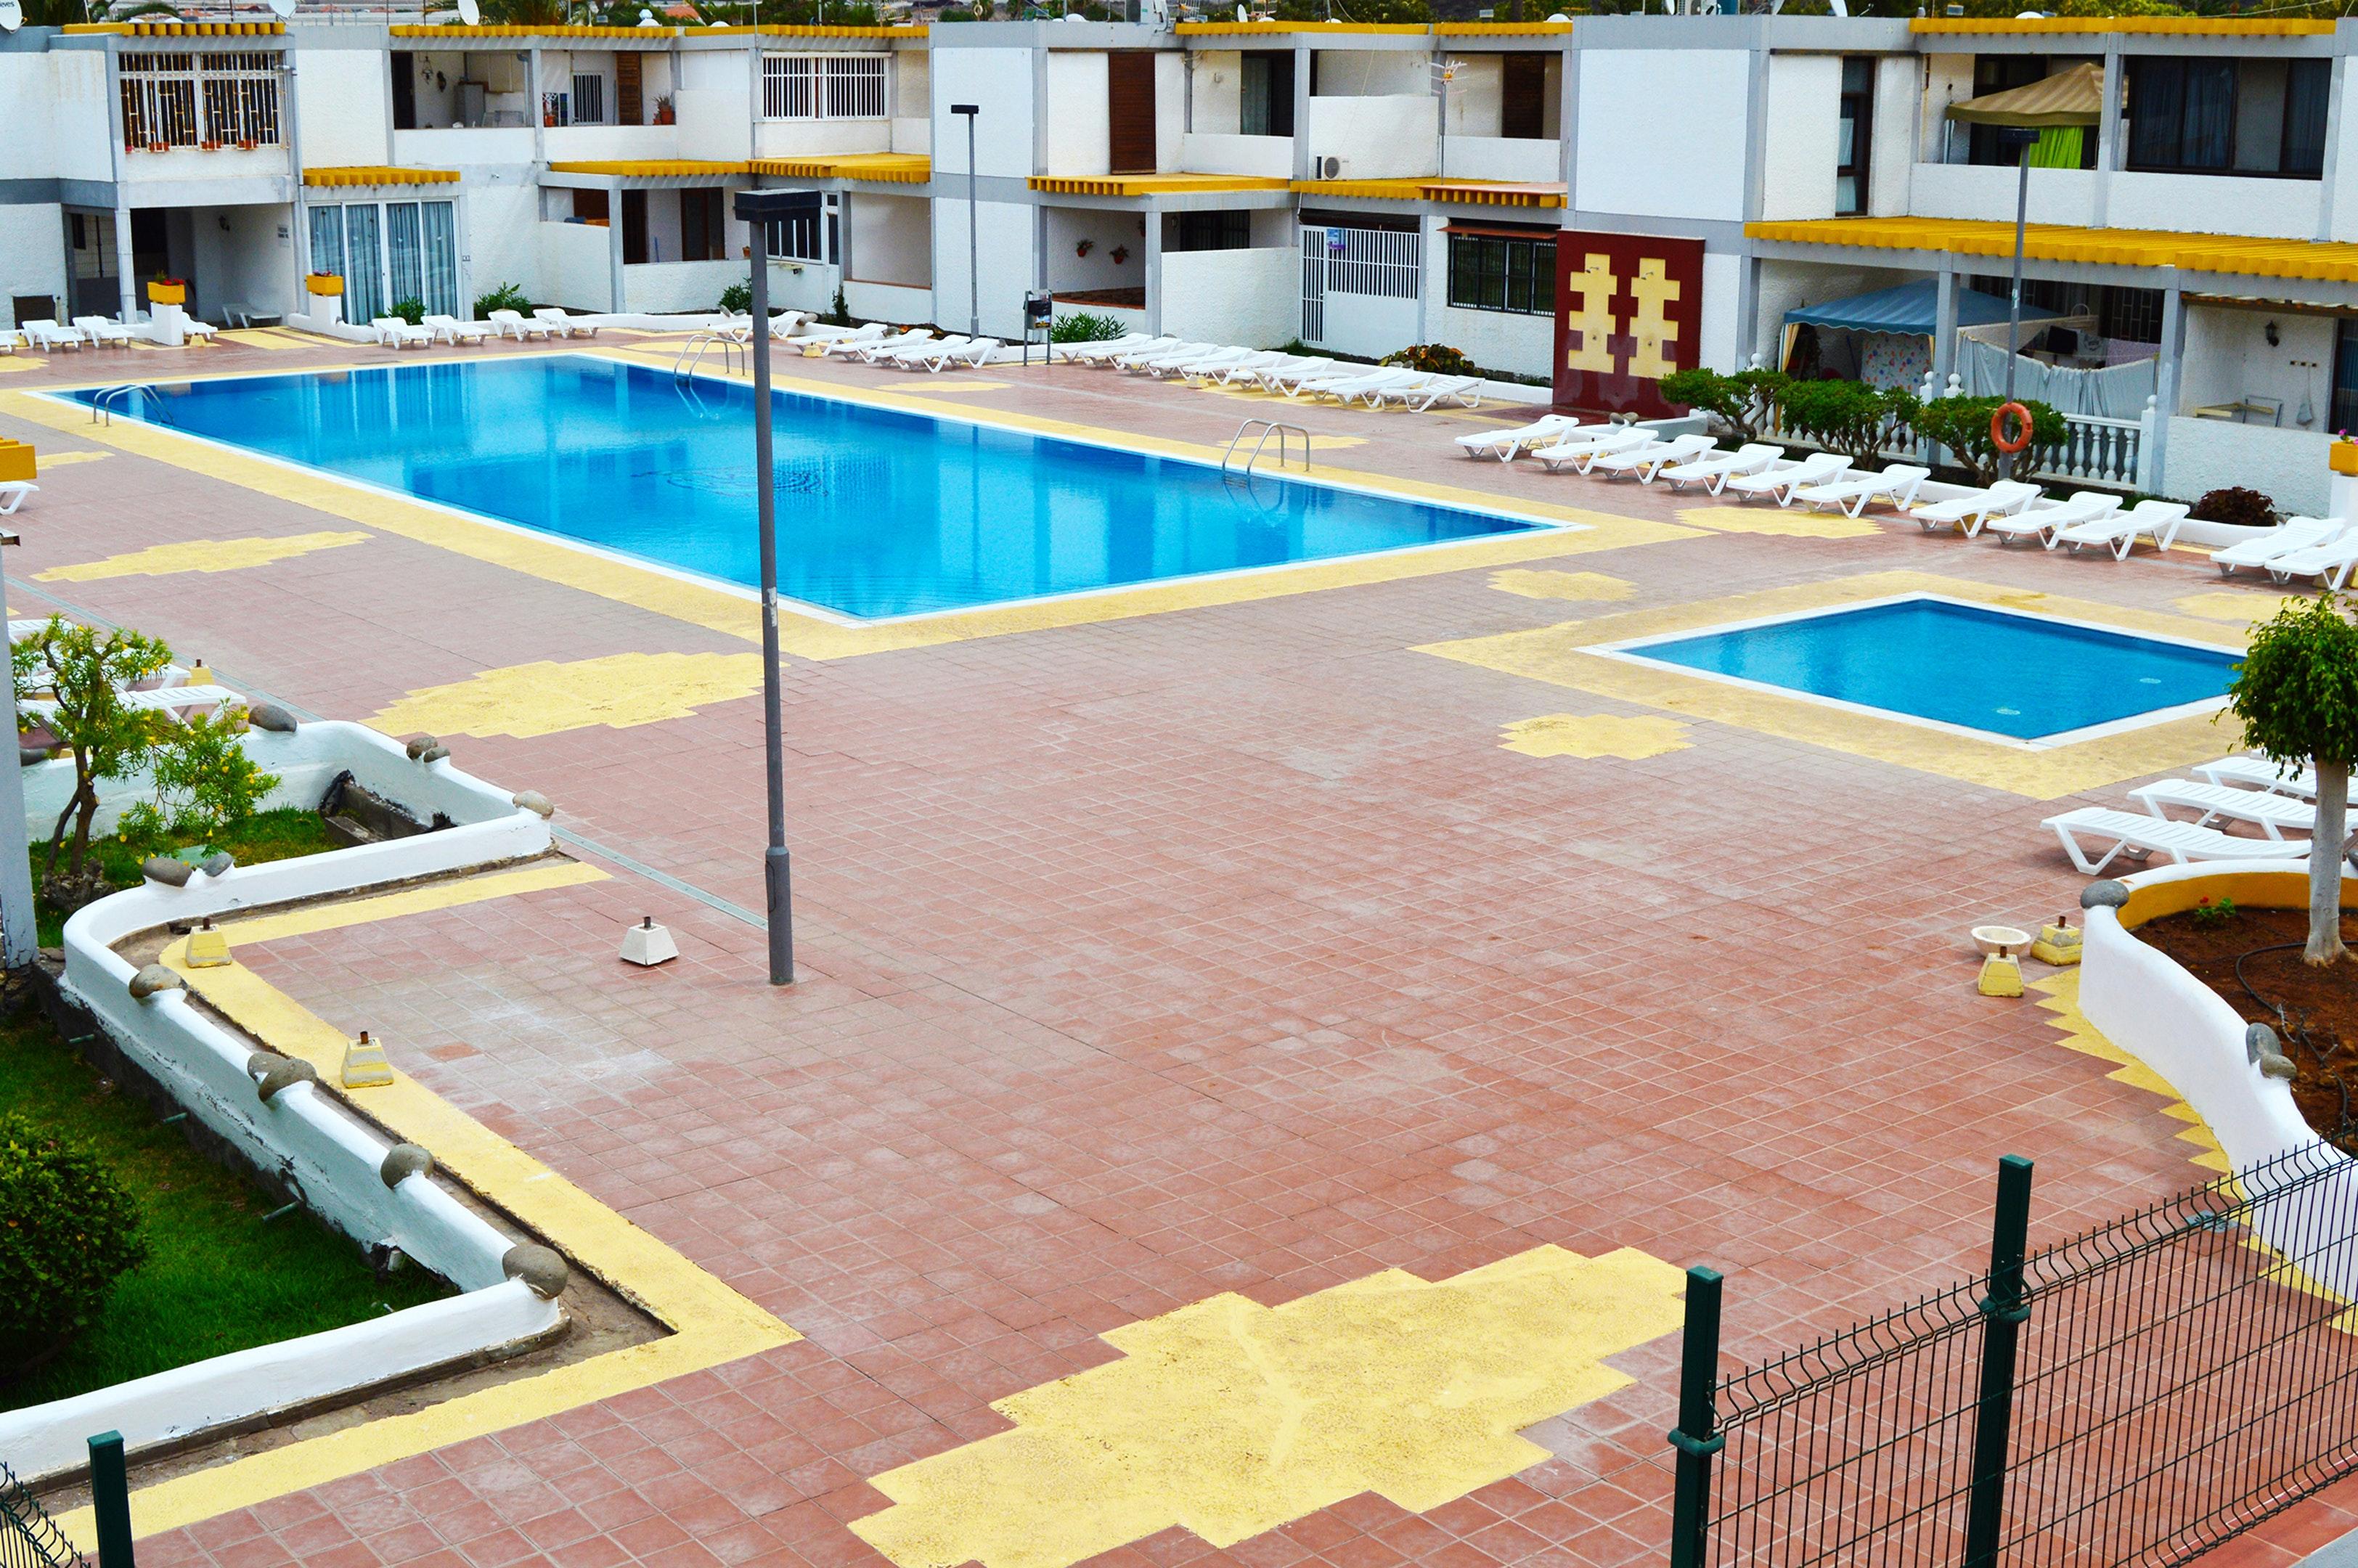 Appartement de vacances Studio in Santa Cruz de Tenerife mit Pool und möbliertem Garten (2218191), San Miguel, Ténérife, Iles Canaries, Espagne, image 18